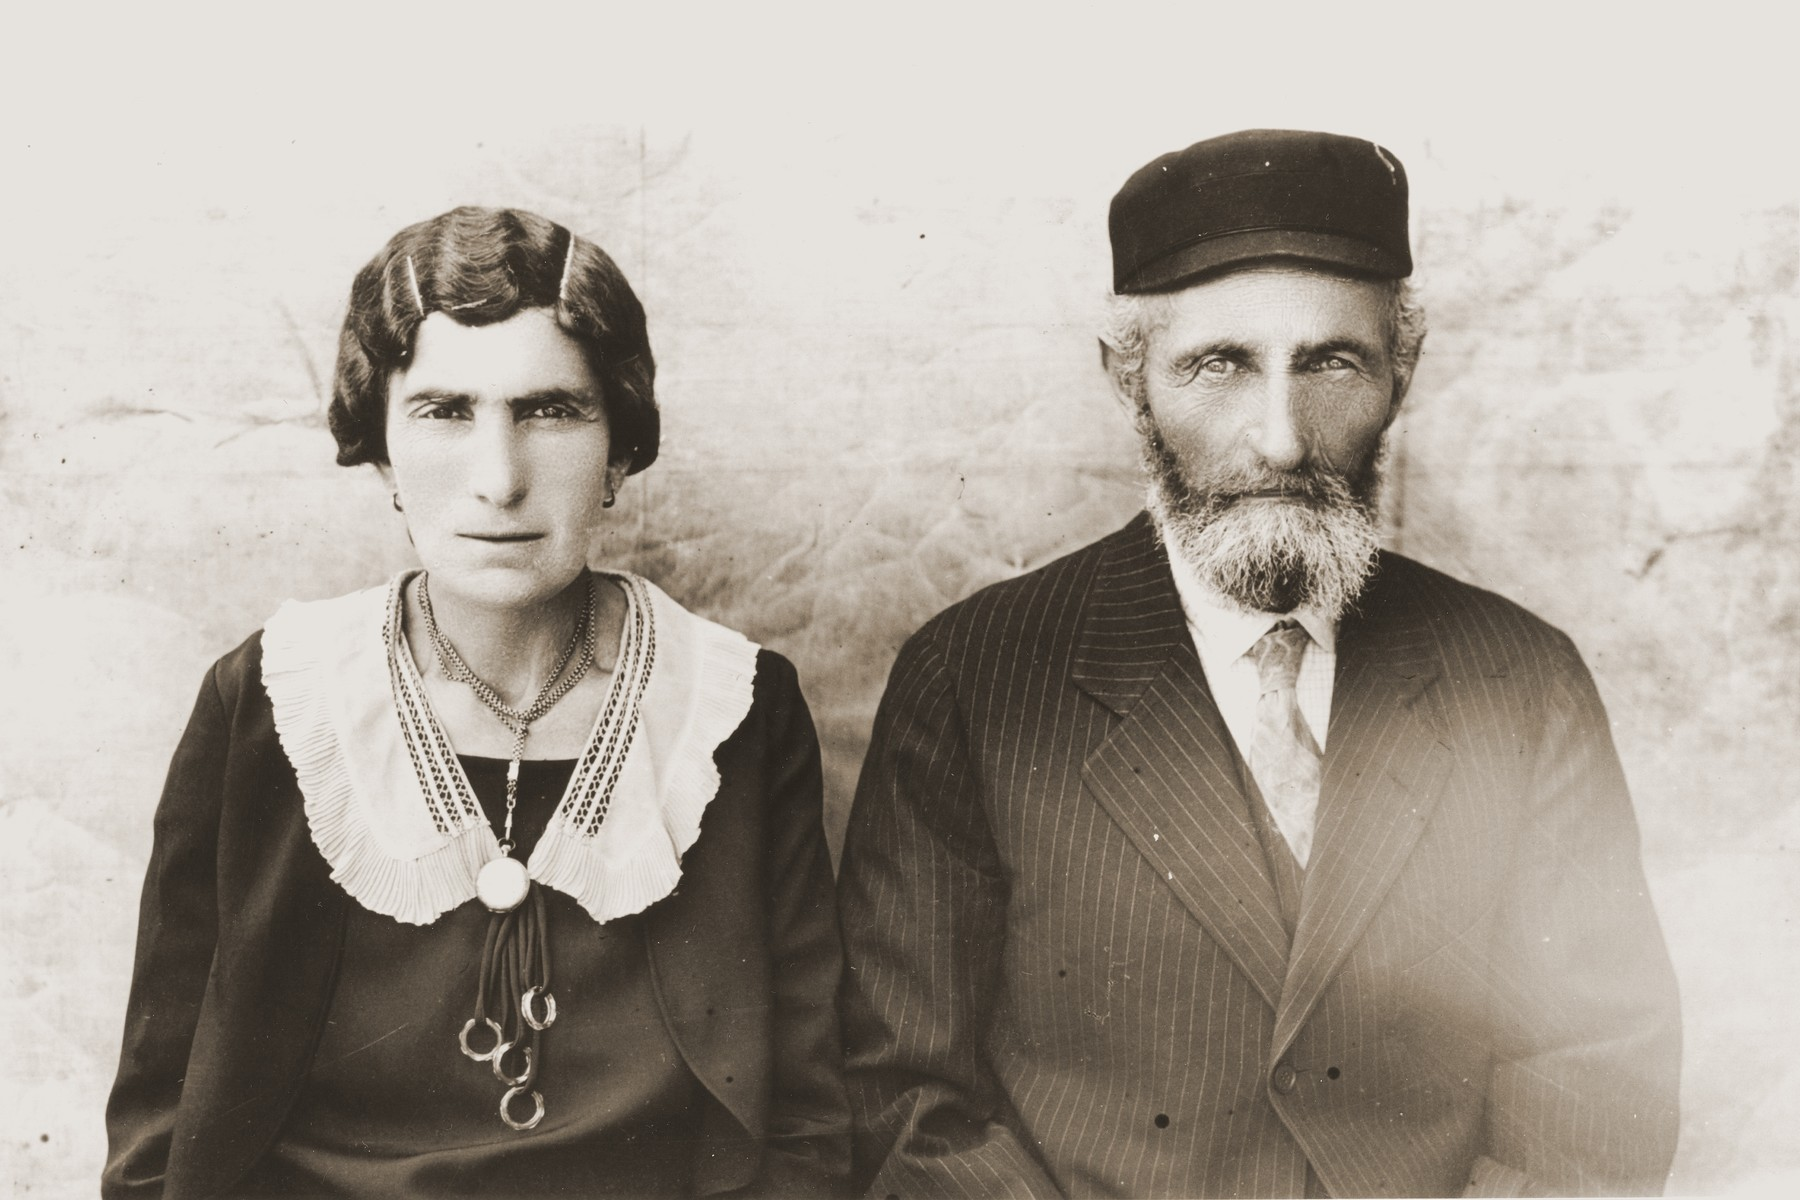 Portrait of Berl and Hanna Gitel (Dresner) Broda, the parents of Tola (Broda) Goldblum.